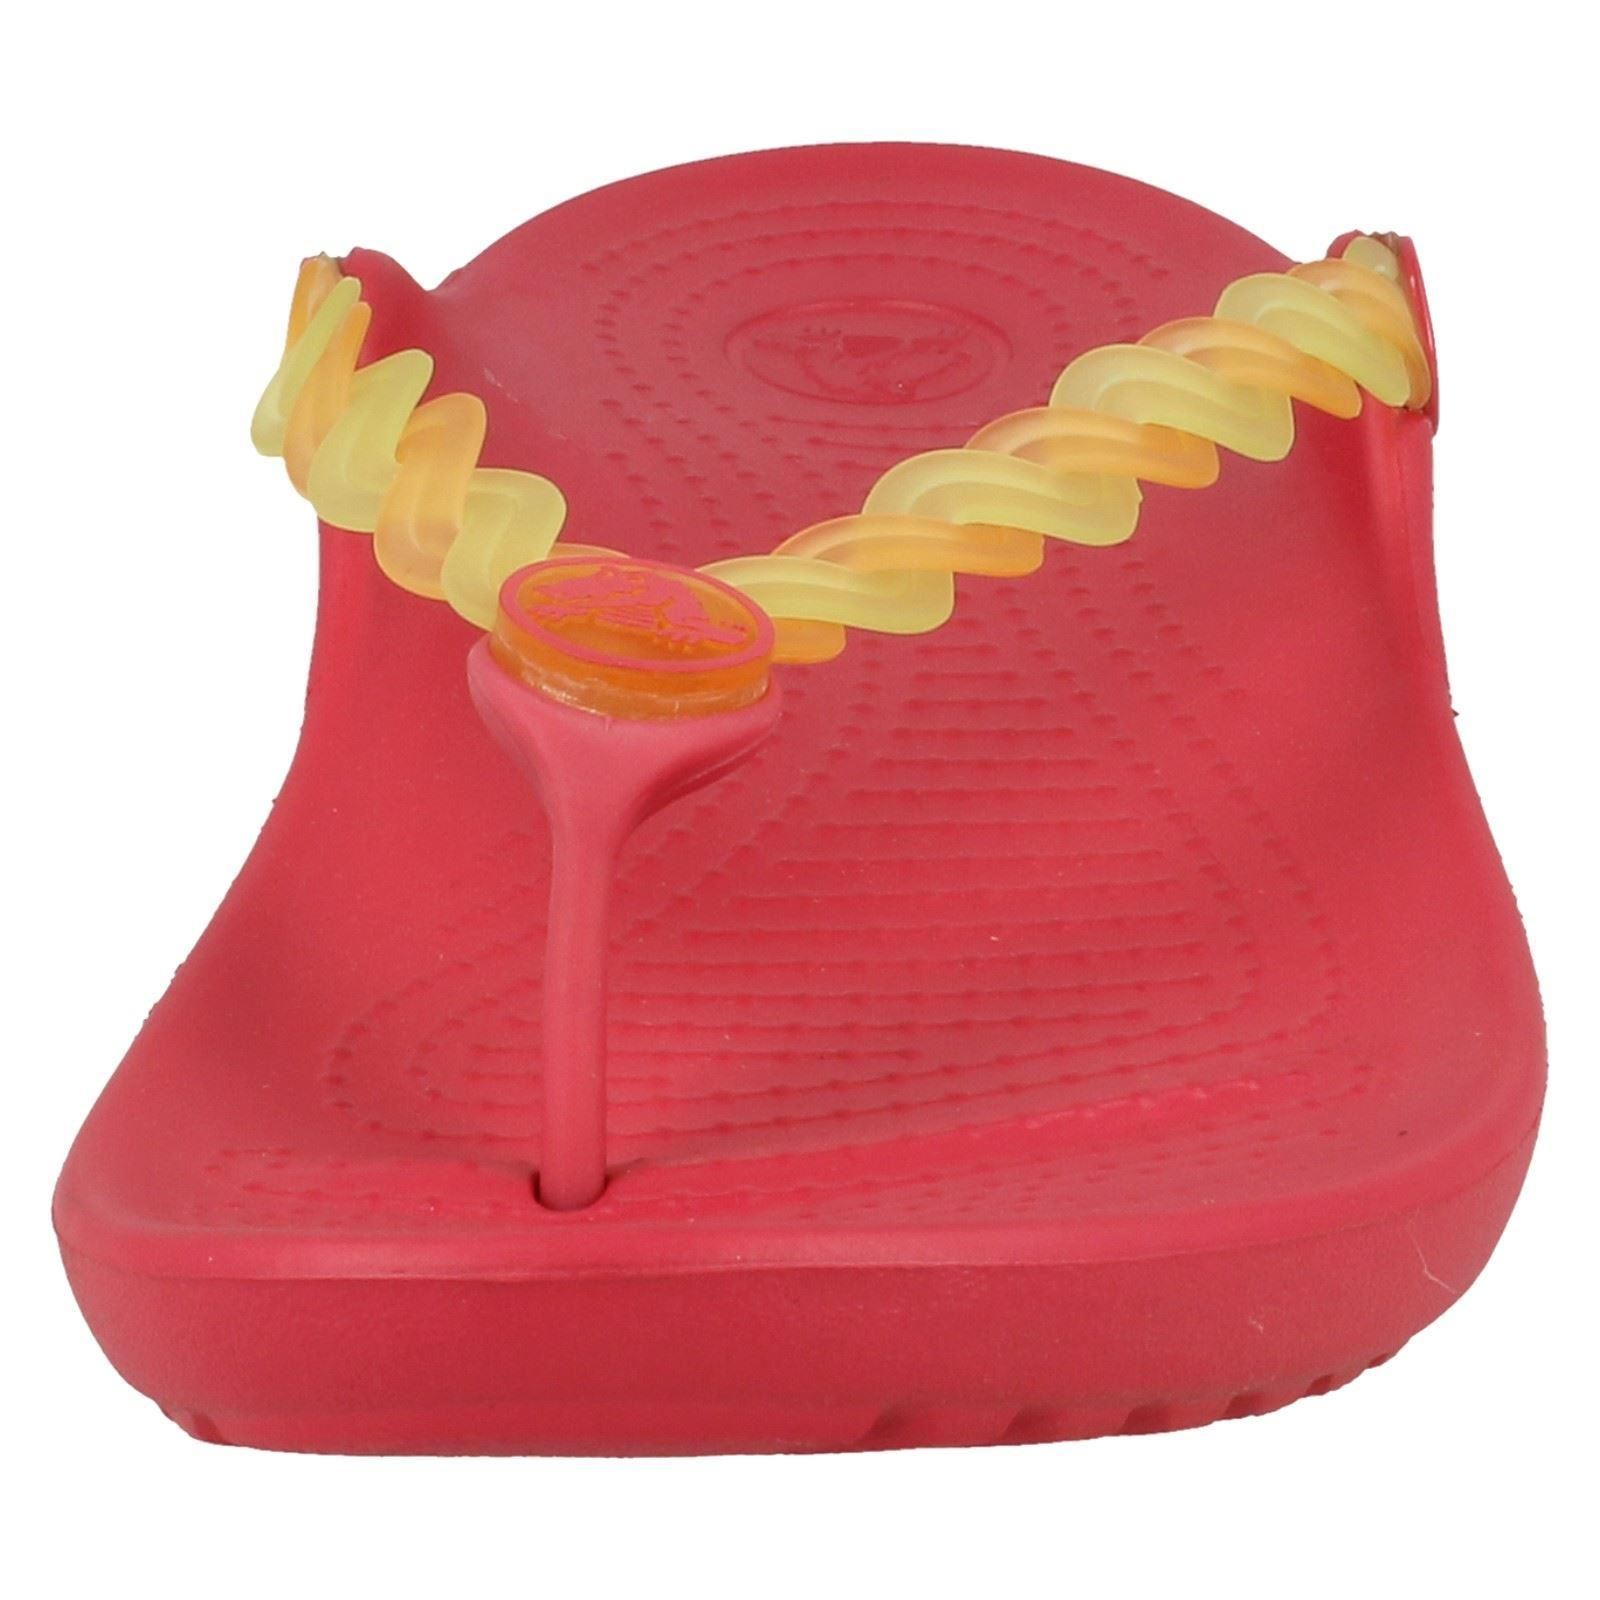 Girls Crocs Toe Post Sandals /'Chmlns Tns Weave Flp/'